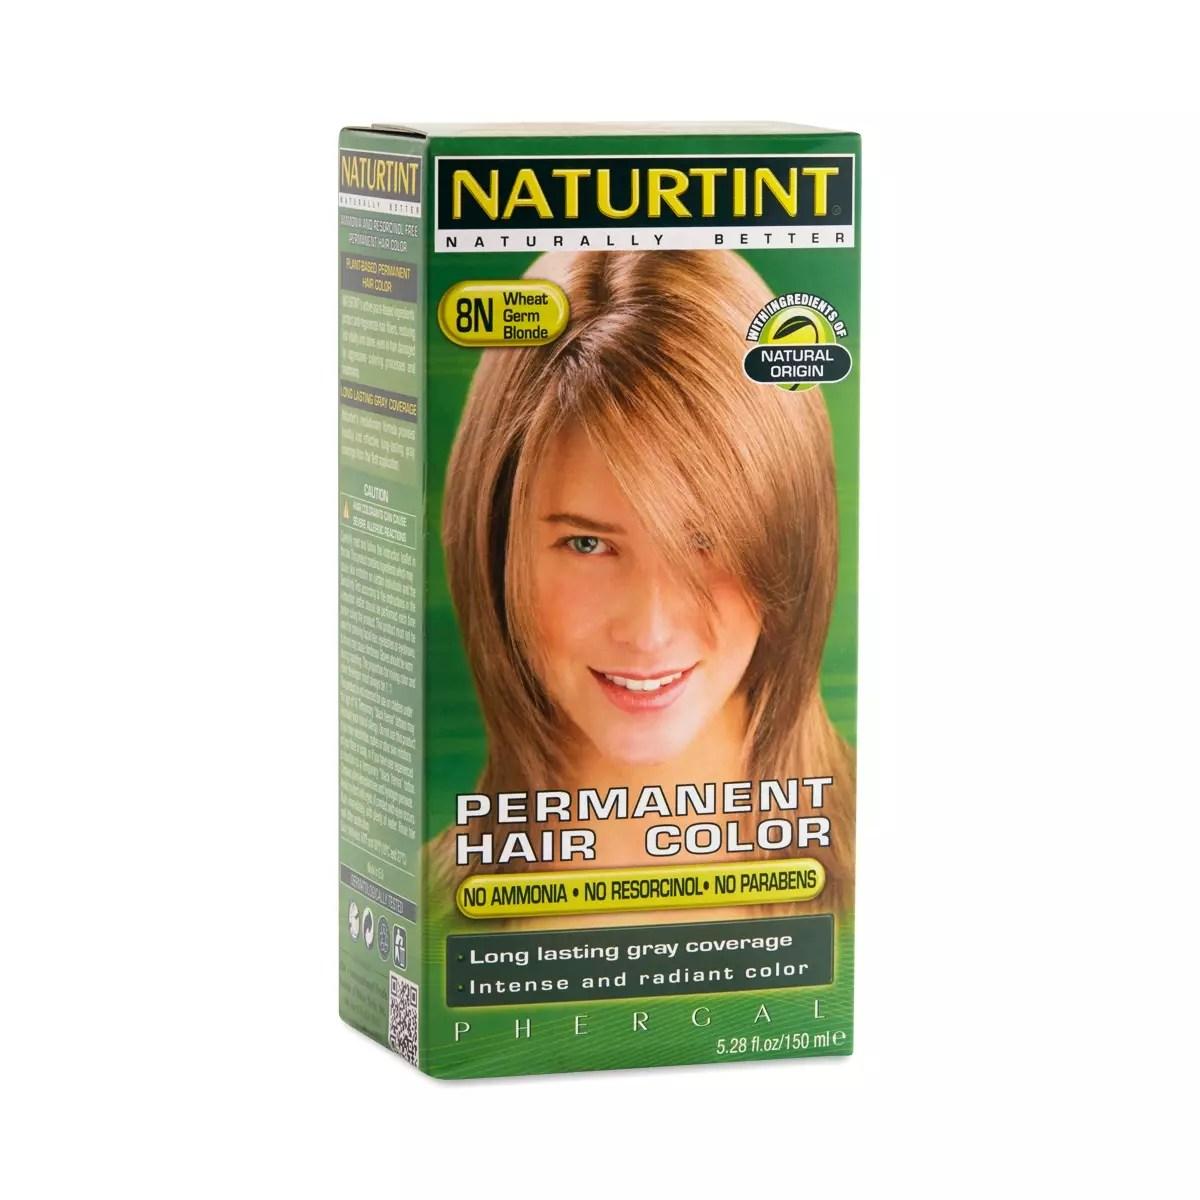 Naturtint Permanent Hair Color 5n Light Chestnut Brown